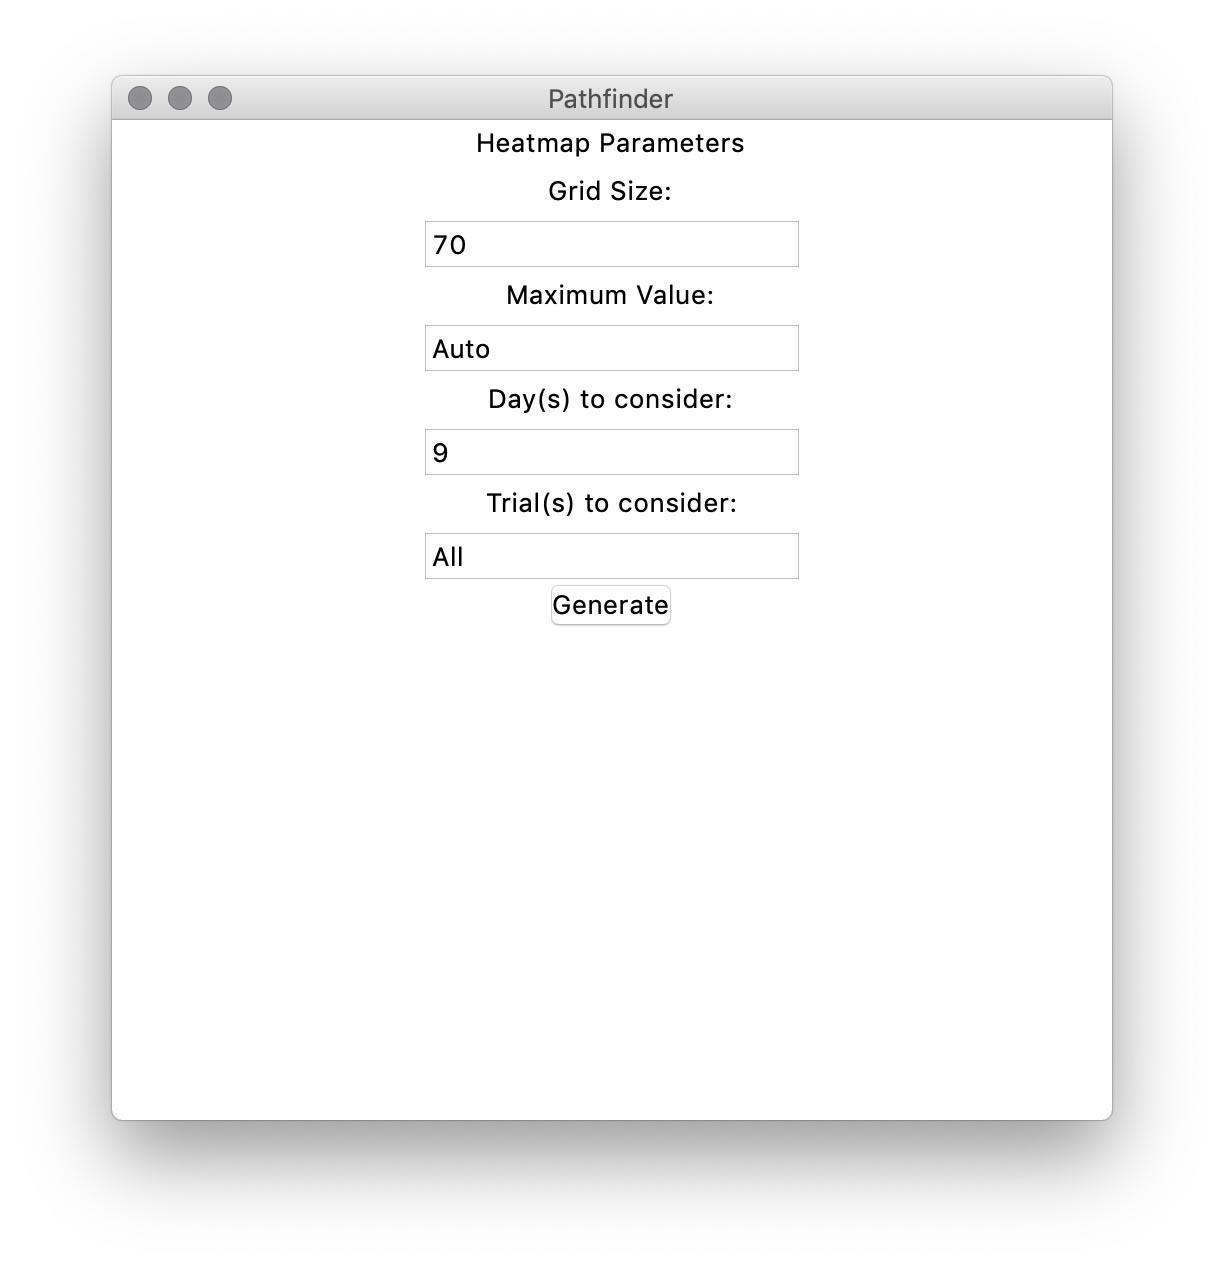 Heatmap parameters